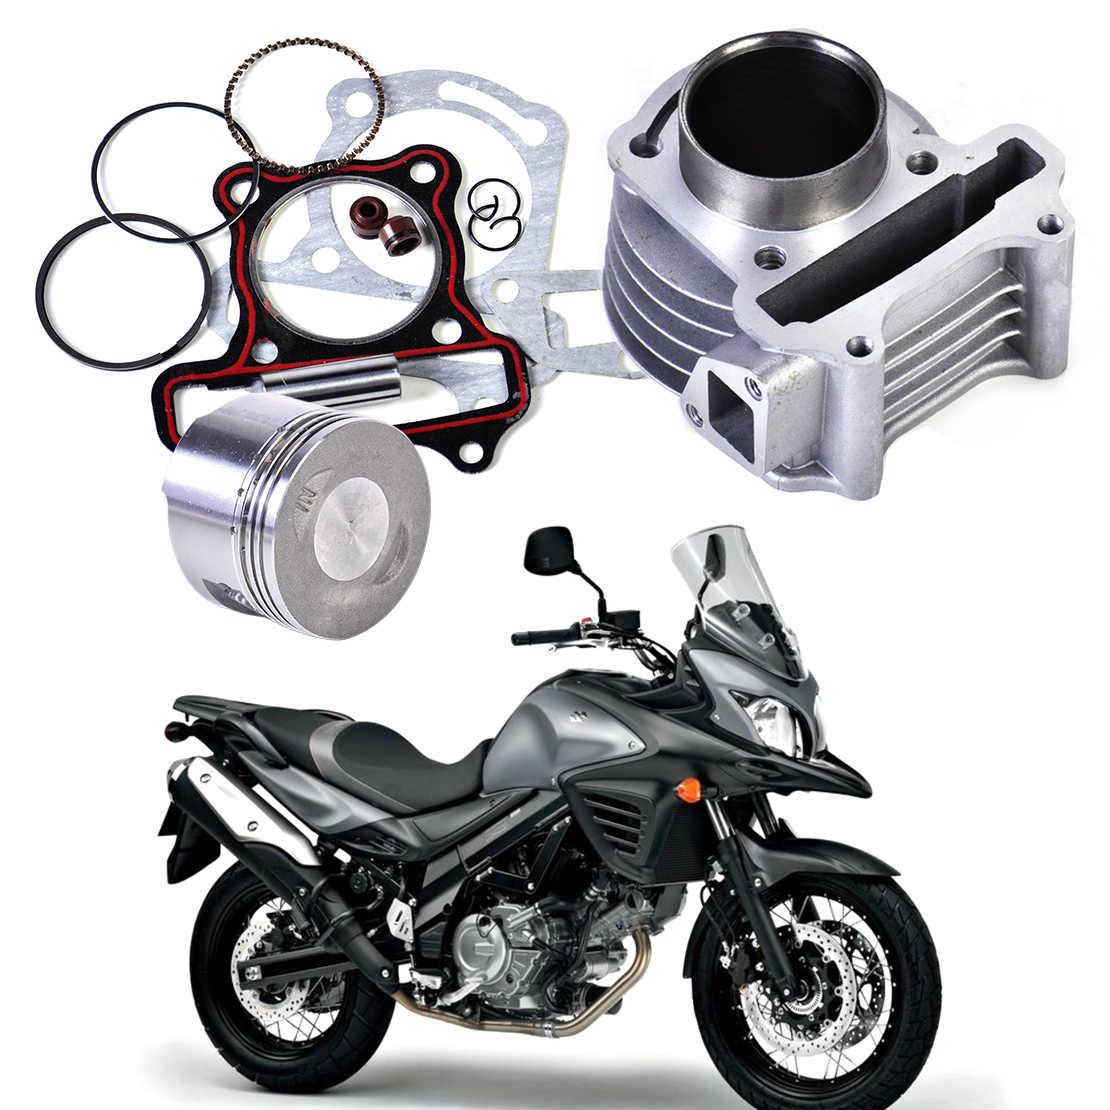 DWCX Baru 47mm Big Bore Kit Cylinder Piston Rings fit untuk GY6 50cc untuk 80cc 4 Stroke Scooter Moped ATV dengan 139QMB 139qma mesin